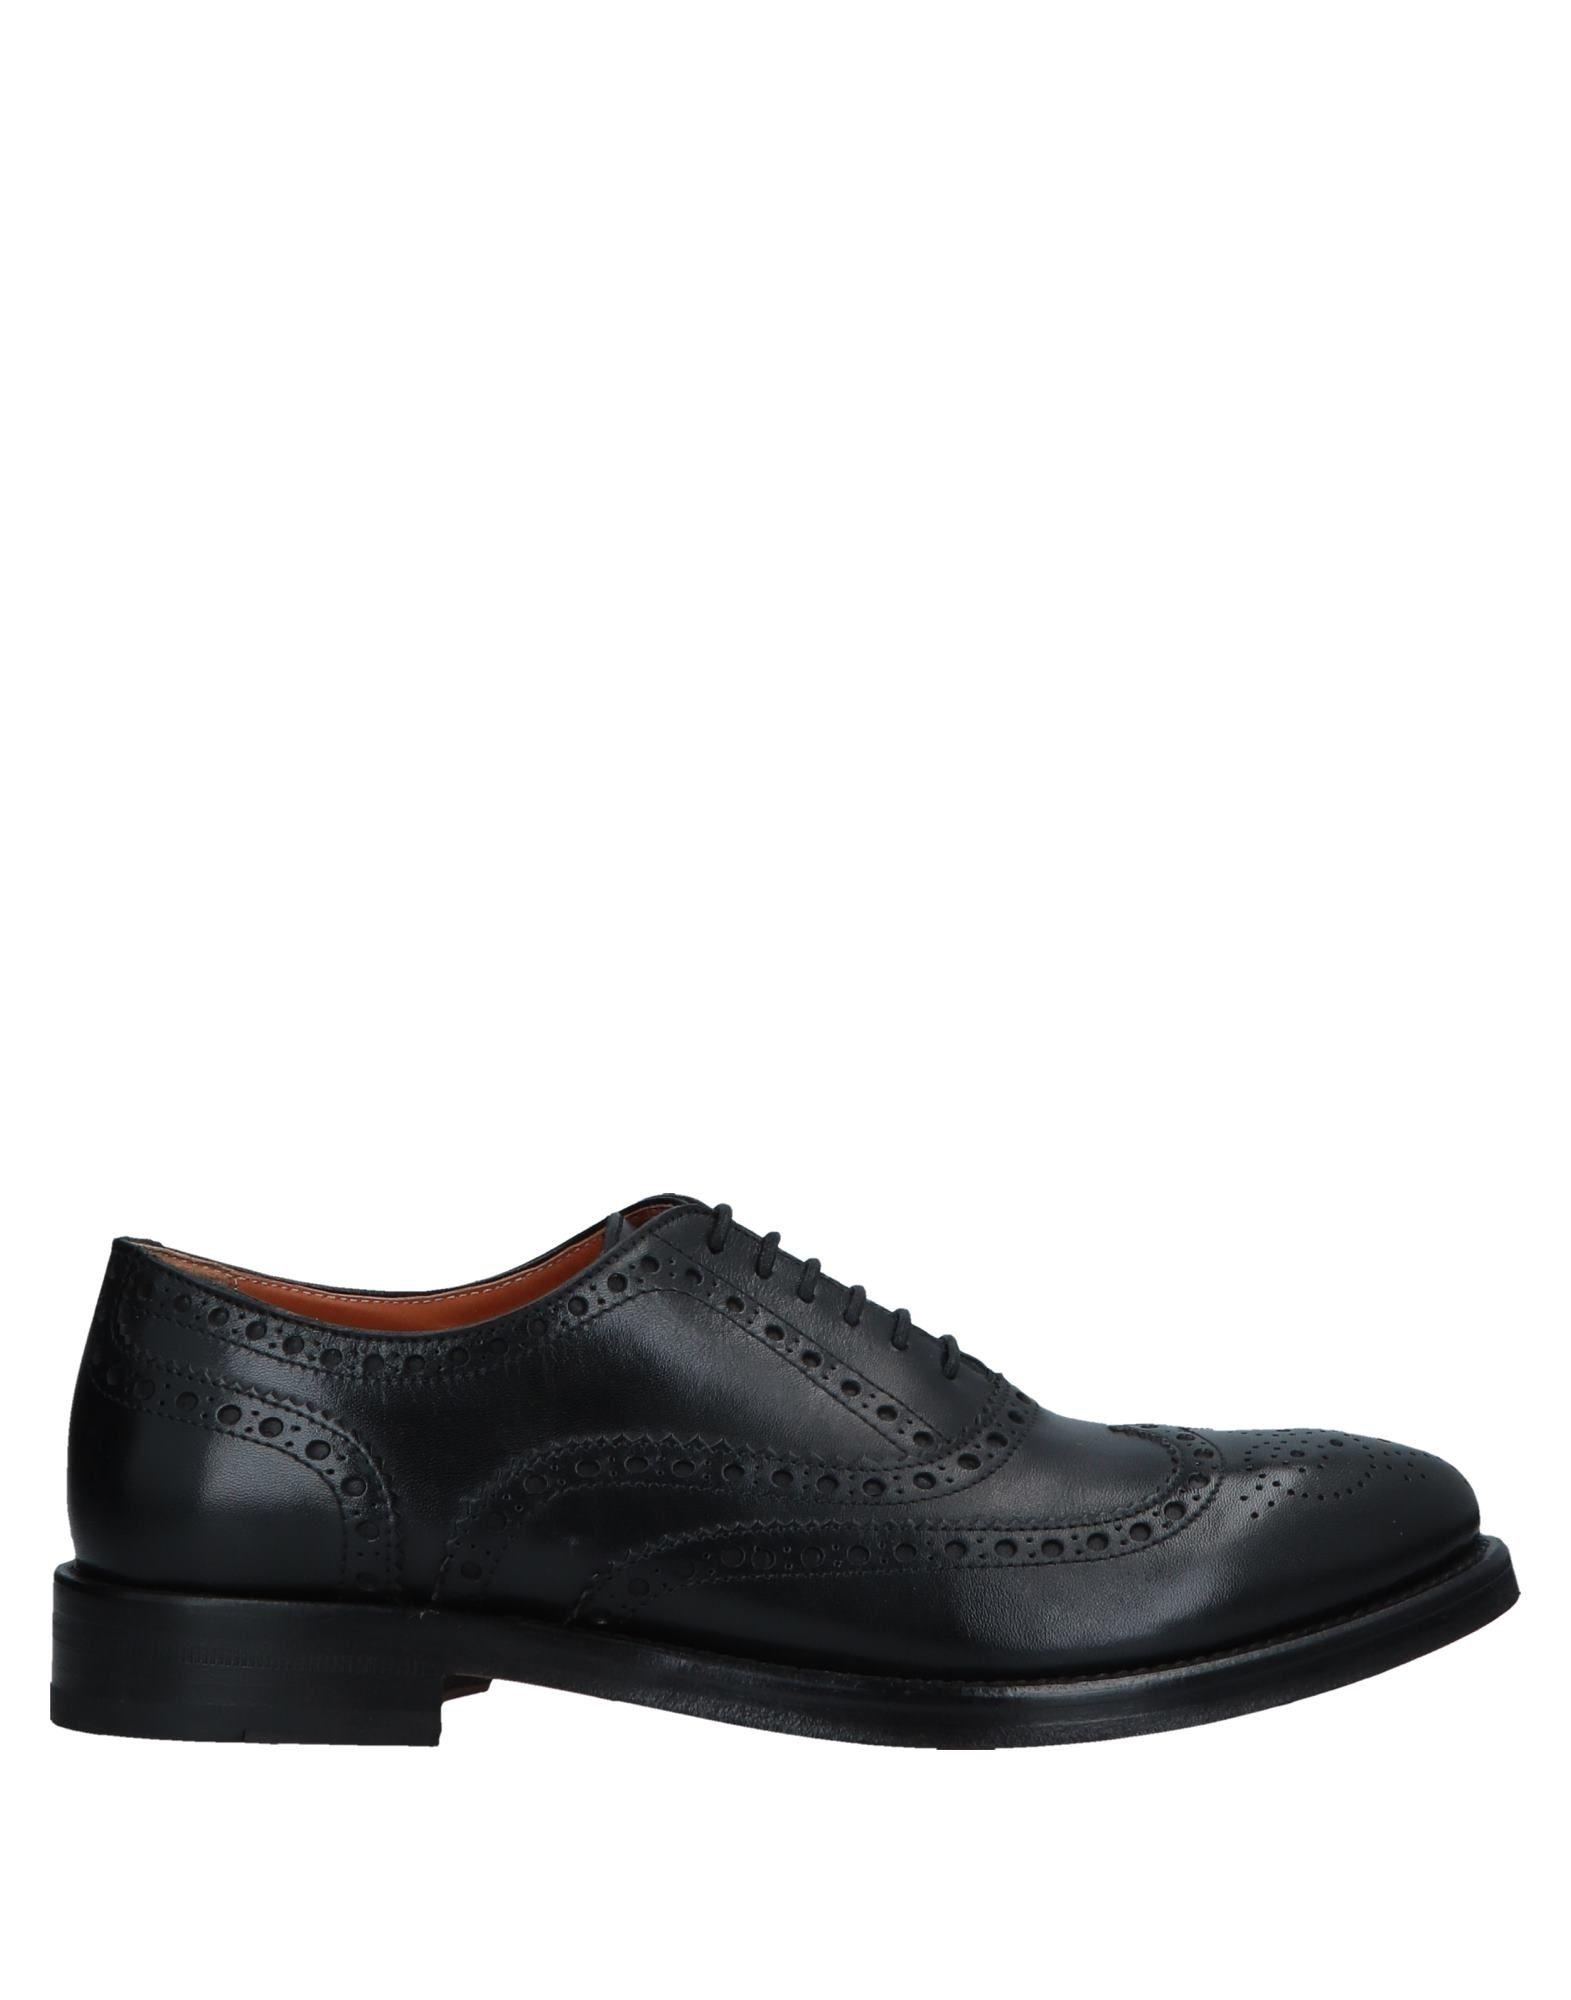 BARRETT Обувь на шнурках обувь на высокой платформе its own brand 116 31 32 33